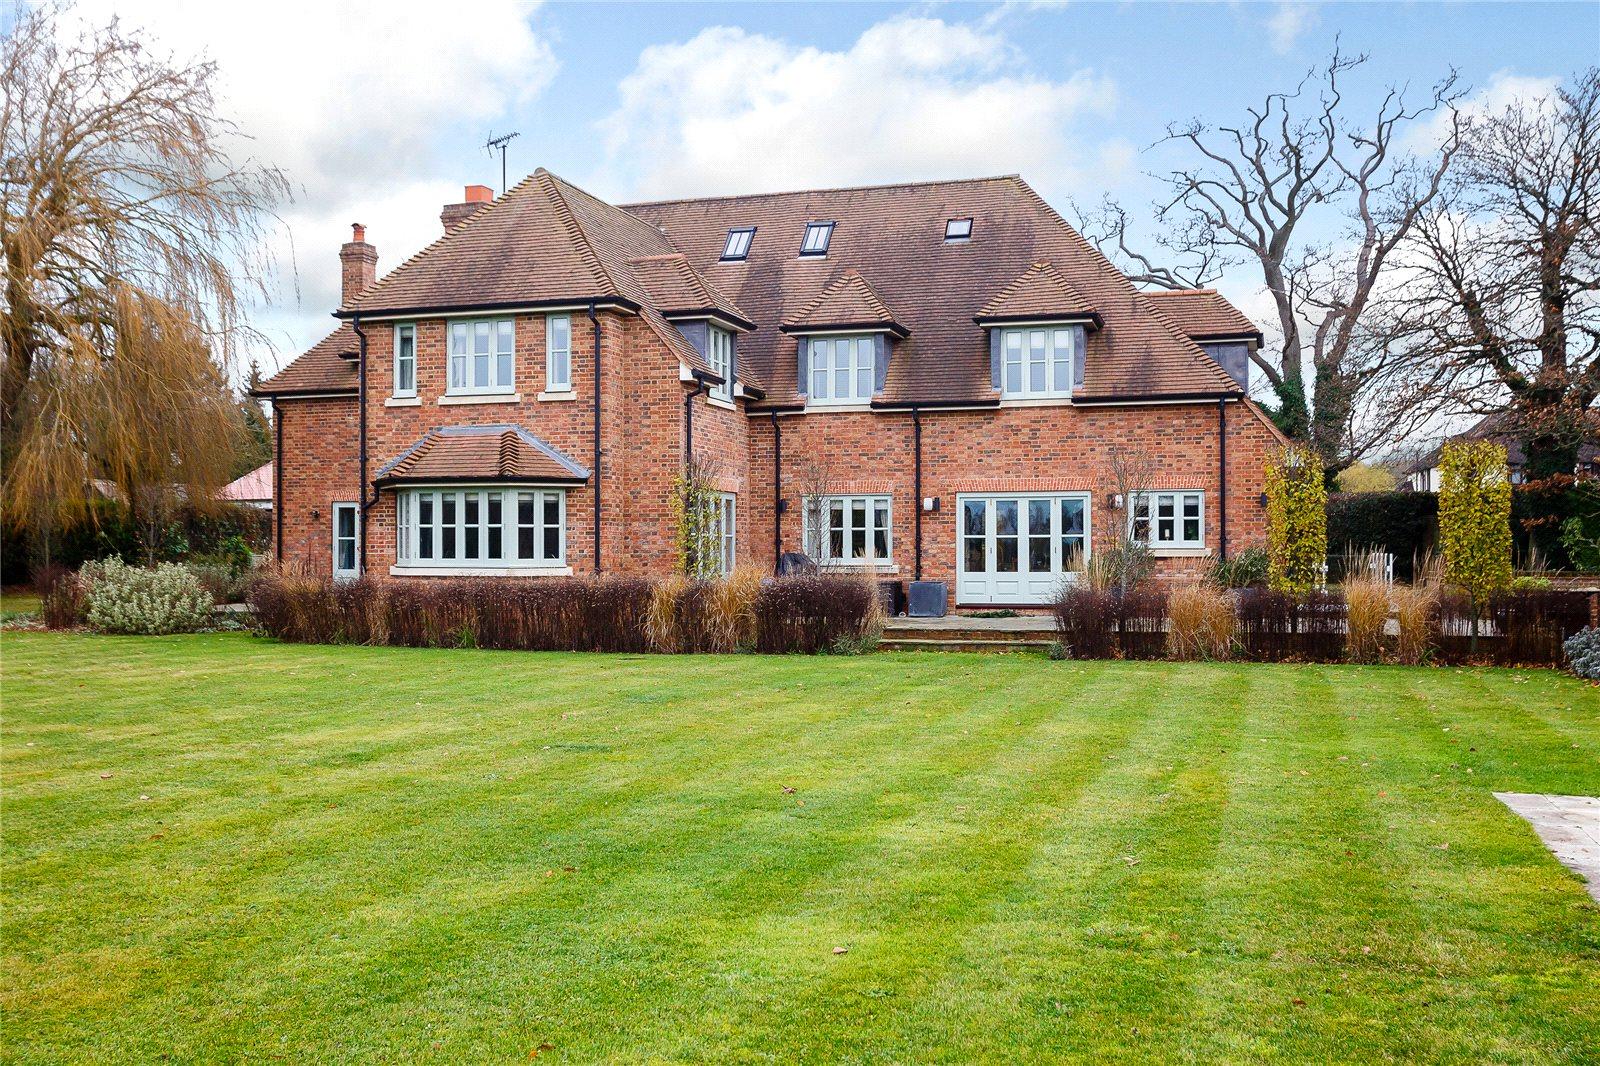 Single Family Home for Sale at Pottersheath Road, Welwyn, Hertfordshire, AL6 Welwyn, England